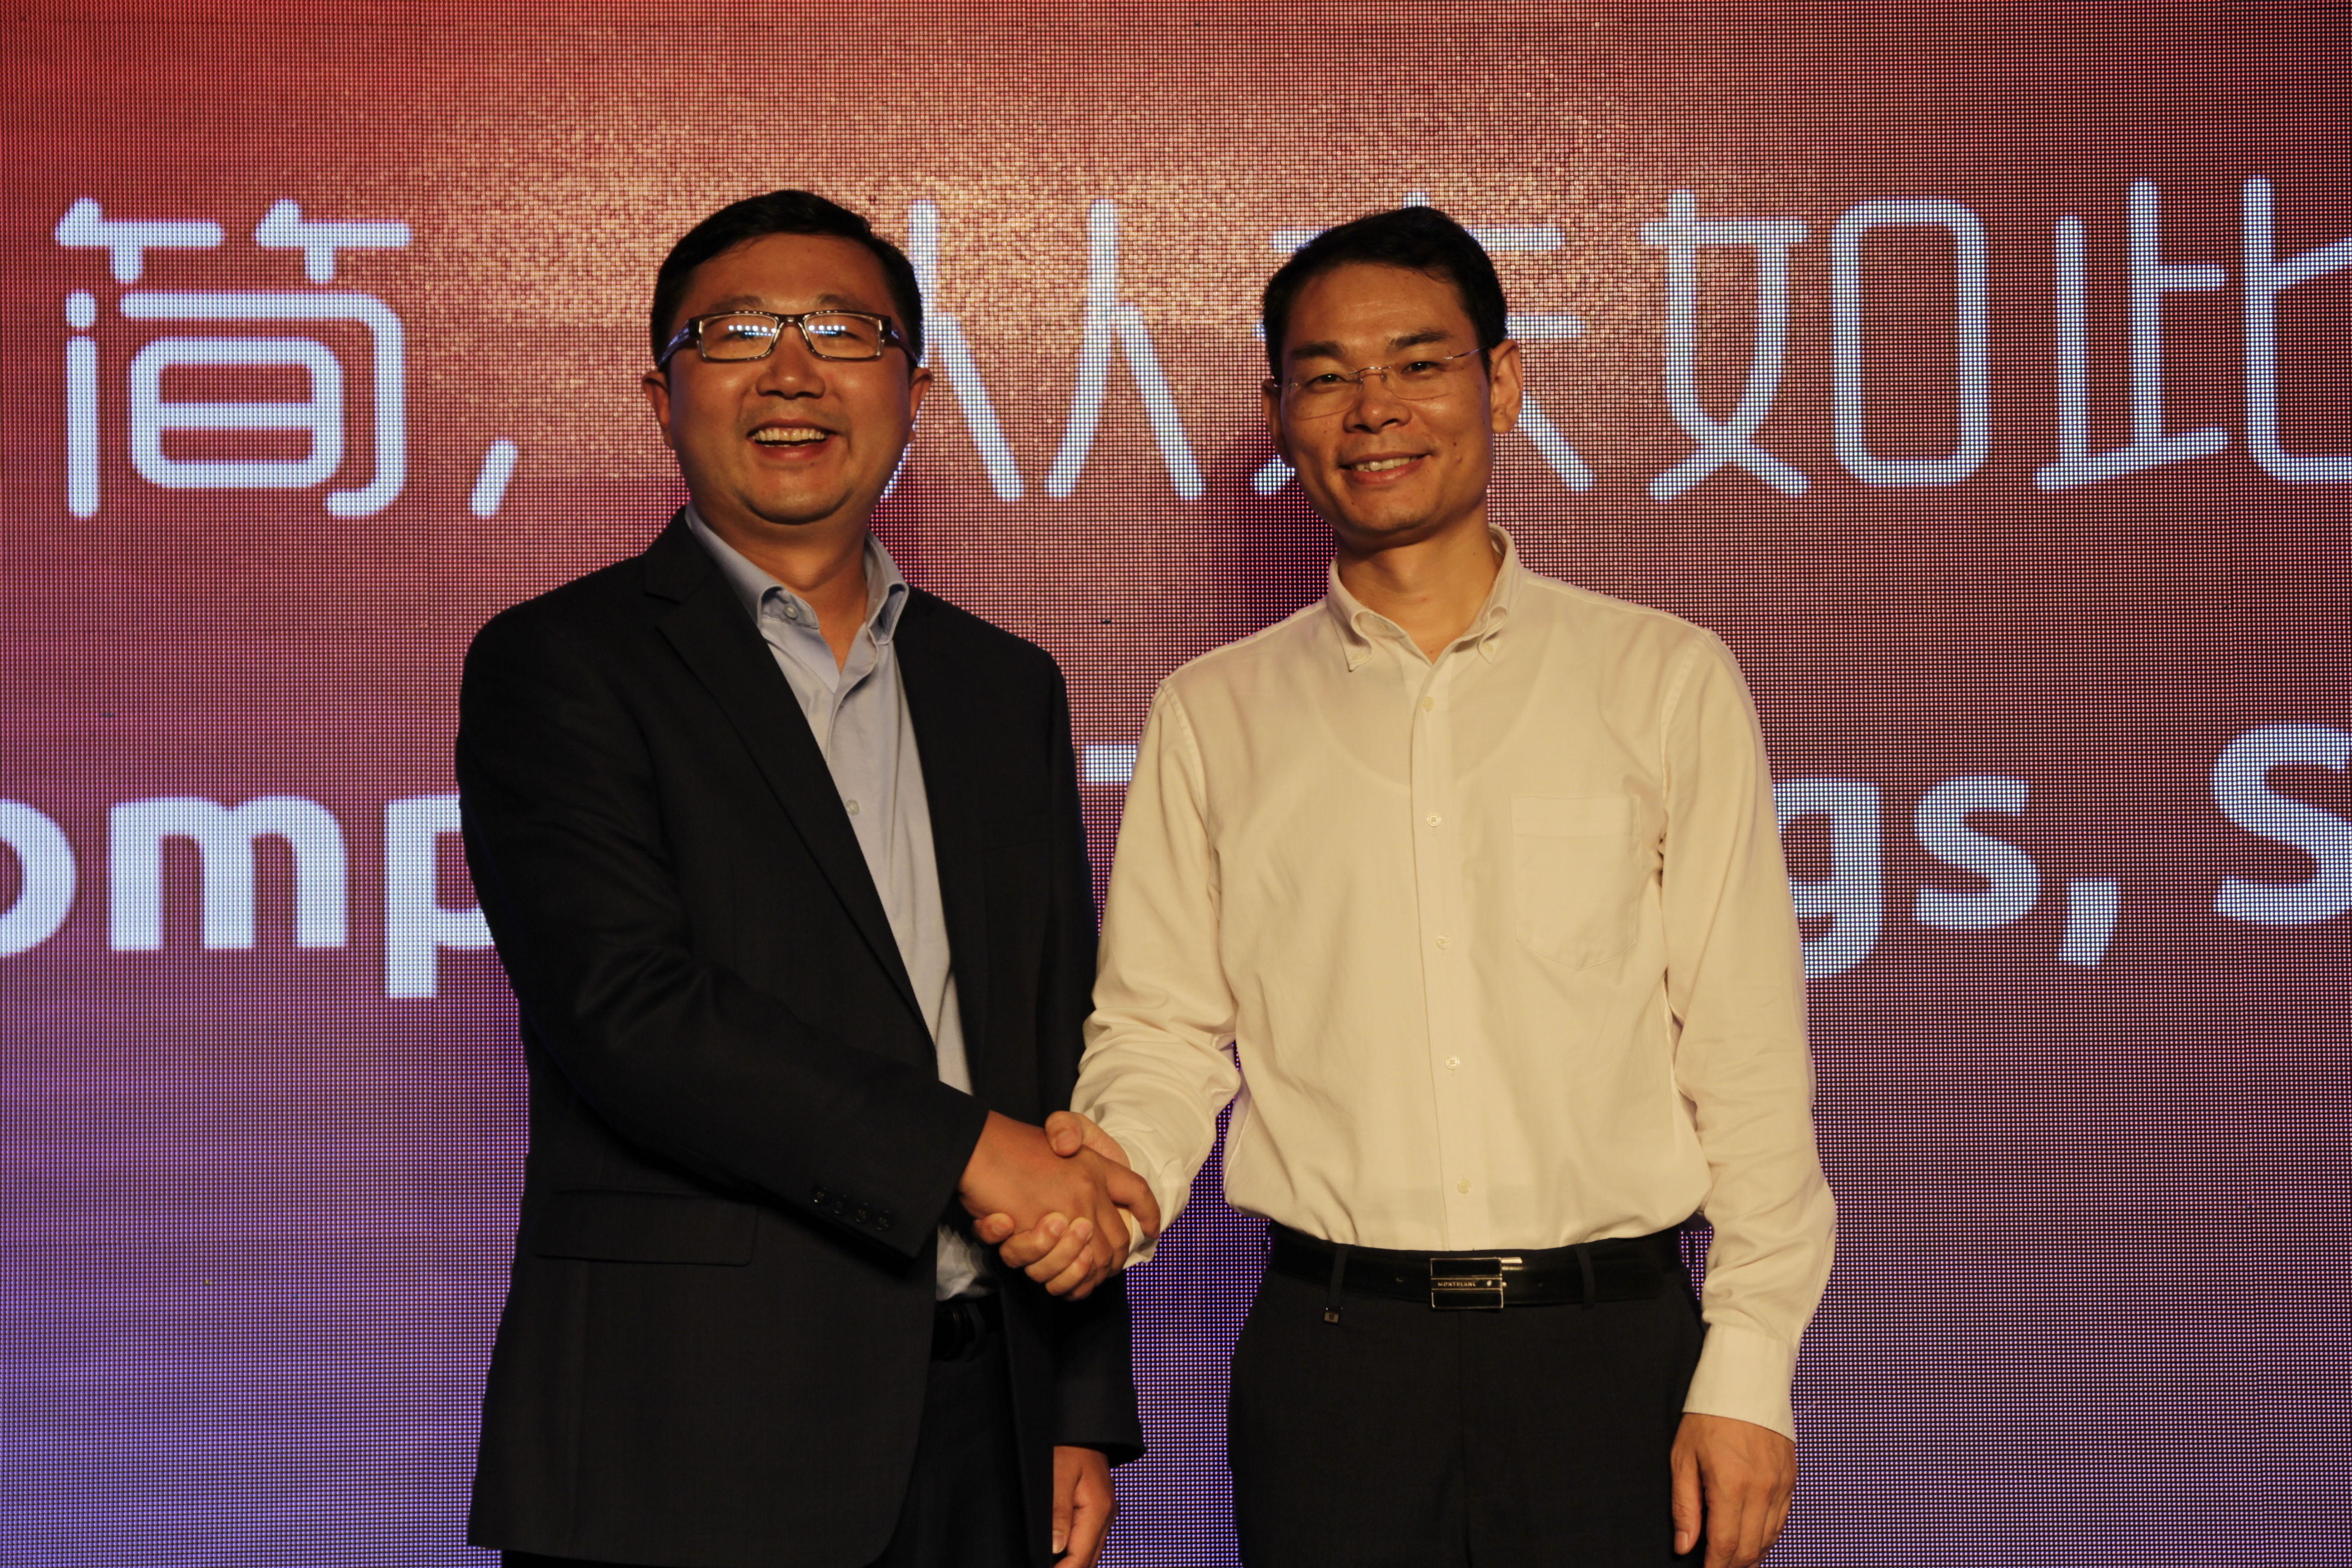 zGlue CEO张铭和京东方智慧系统事业群CEO姚项军.JPG